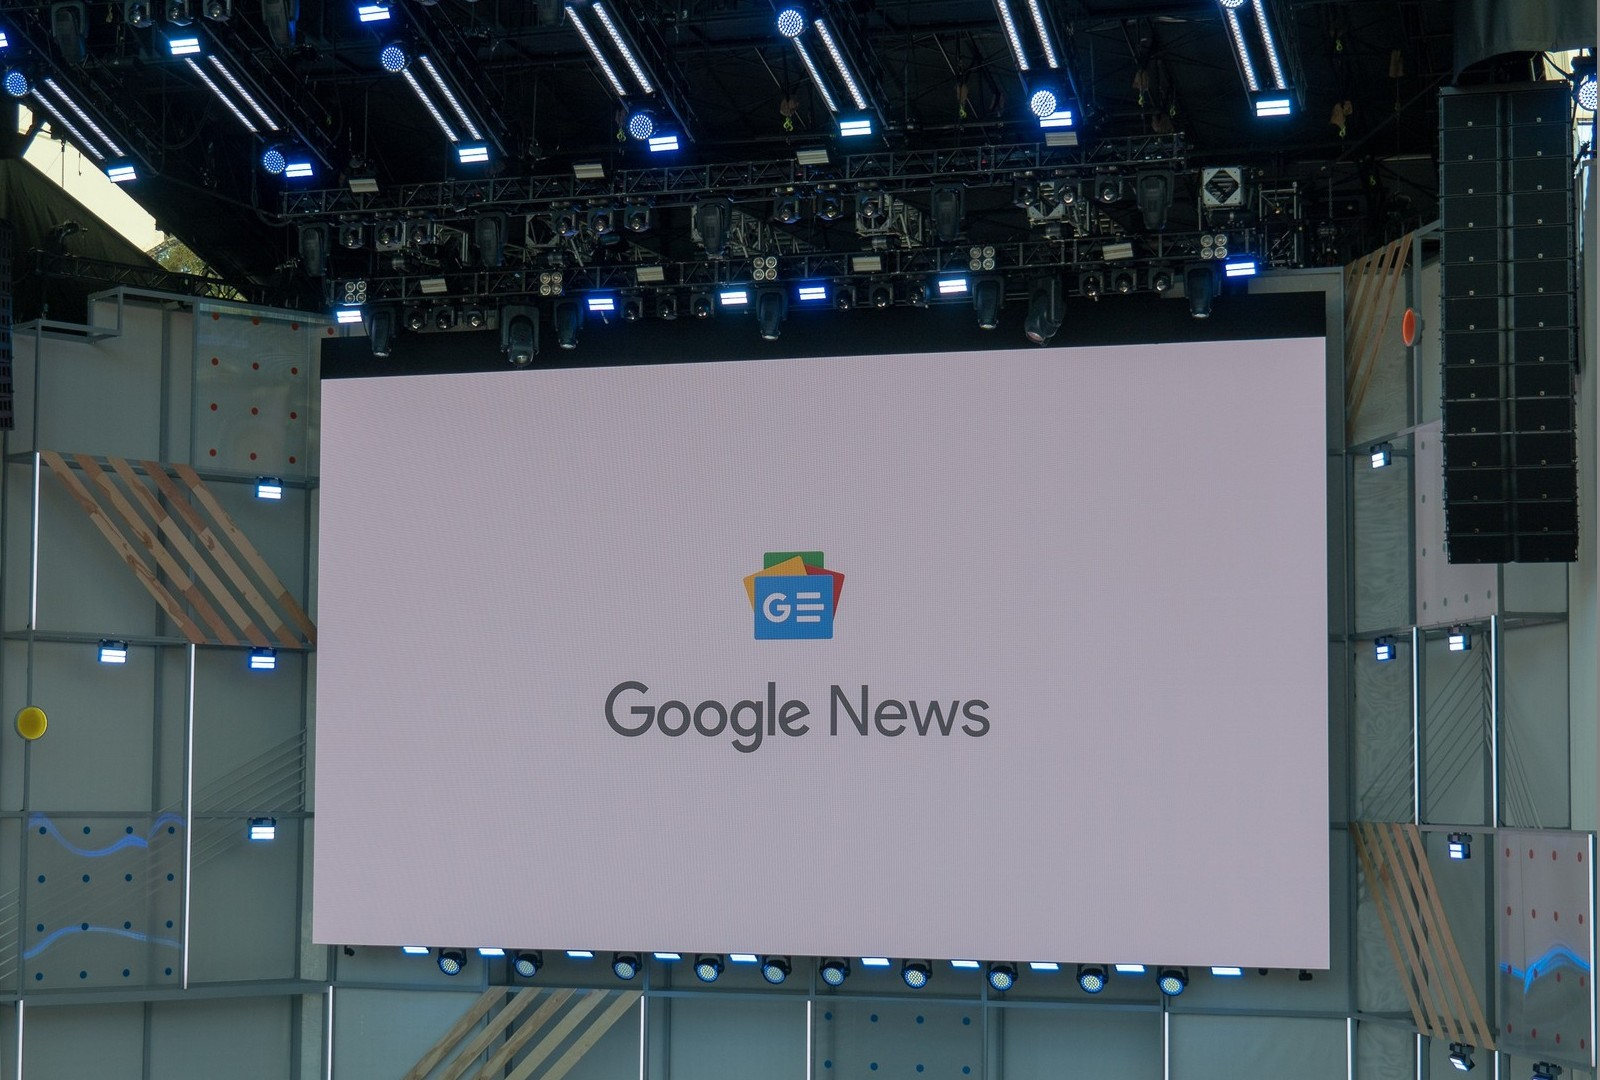 Google news banner image